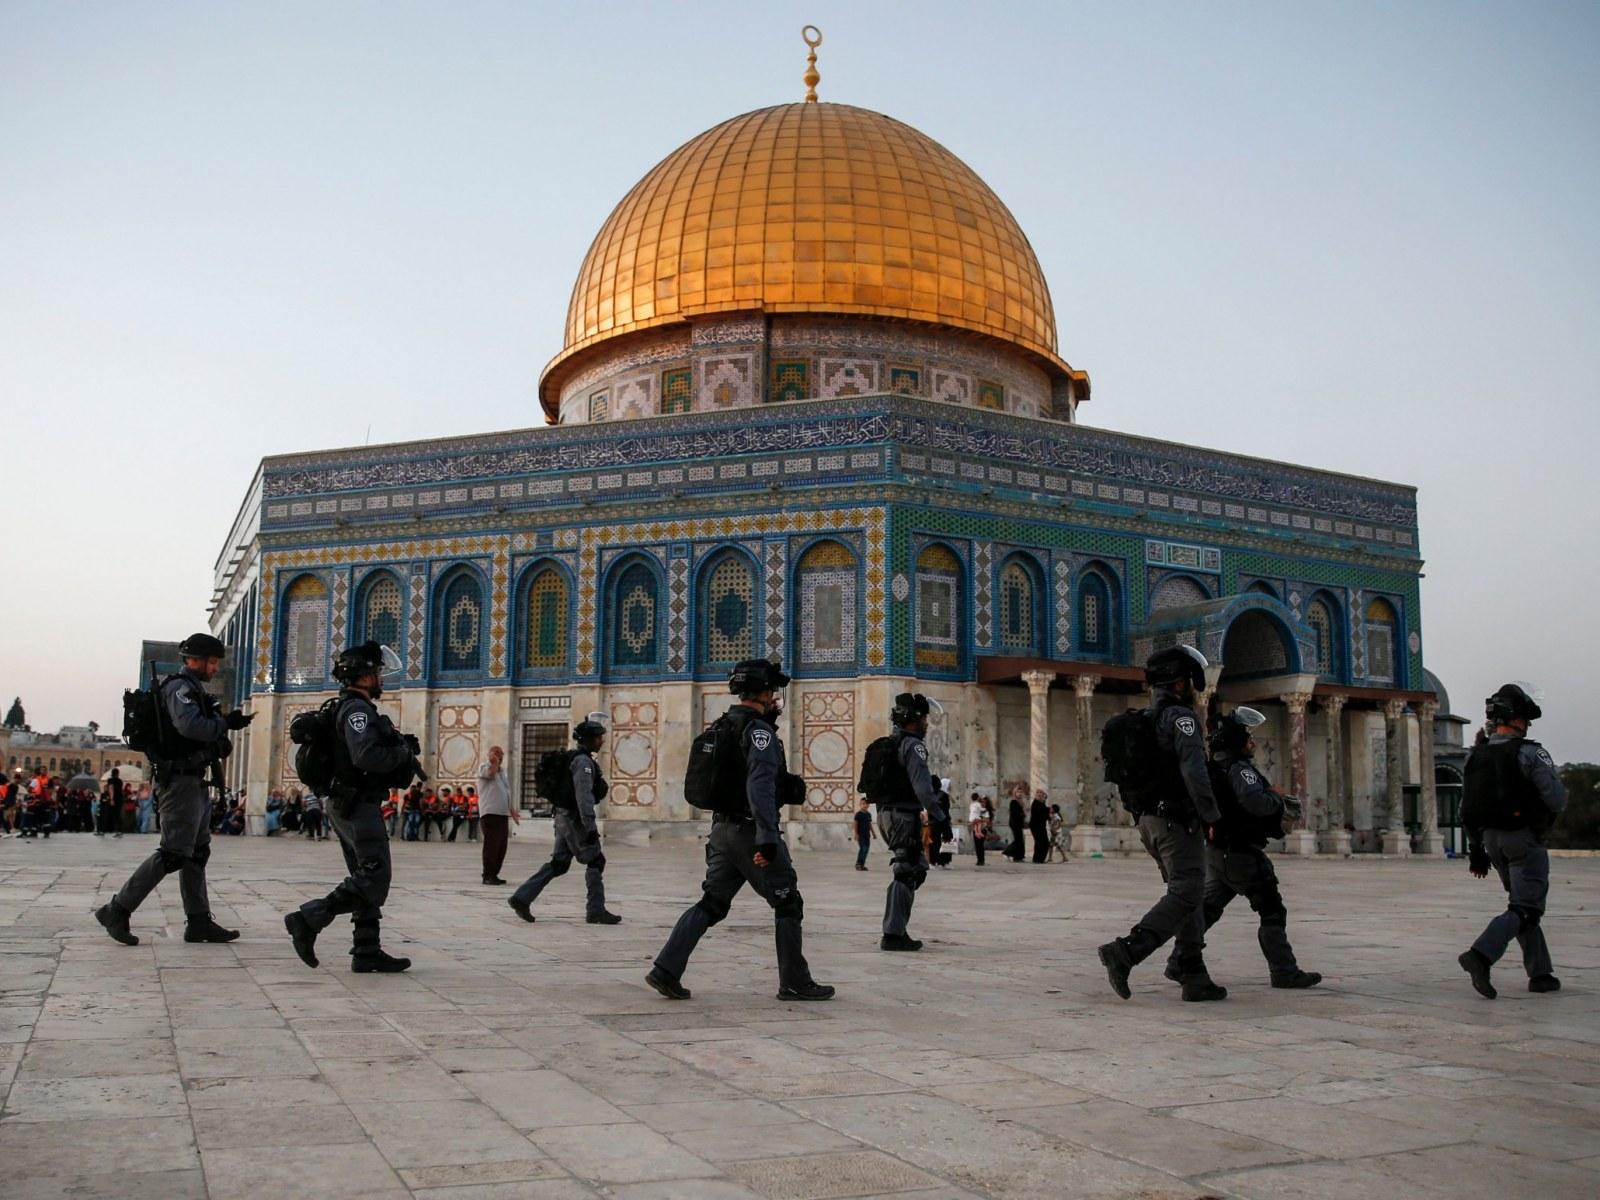 Israel Police Bar Men Under 50 From Holy Site As Jerusalem